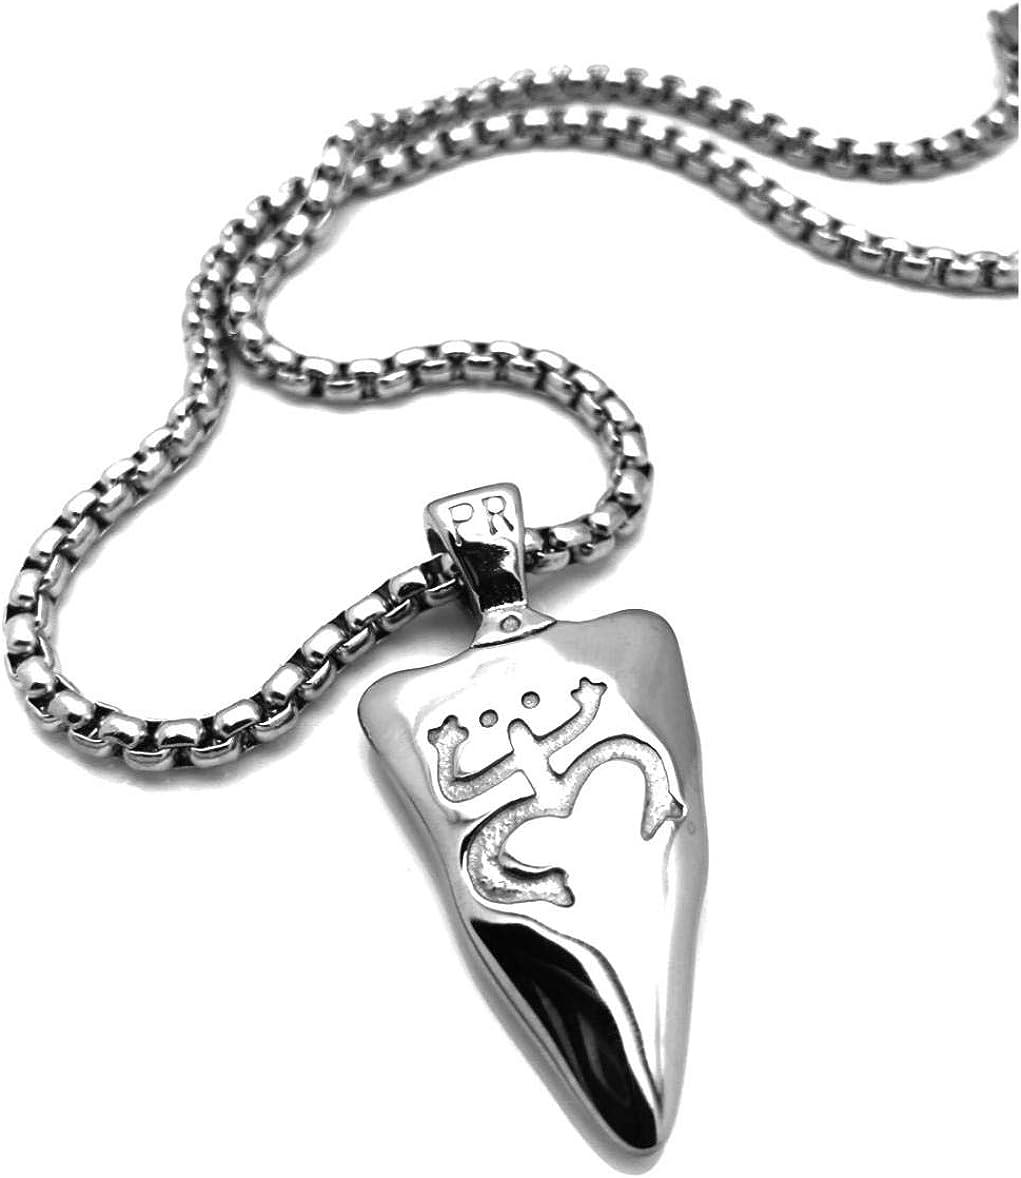 Comedy /& Tragedy R139 Emblem on a 925 Sterling Silver Necklace 16,18,20,26,30